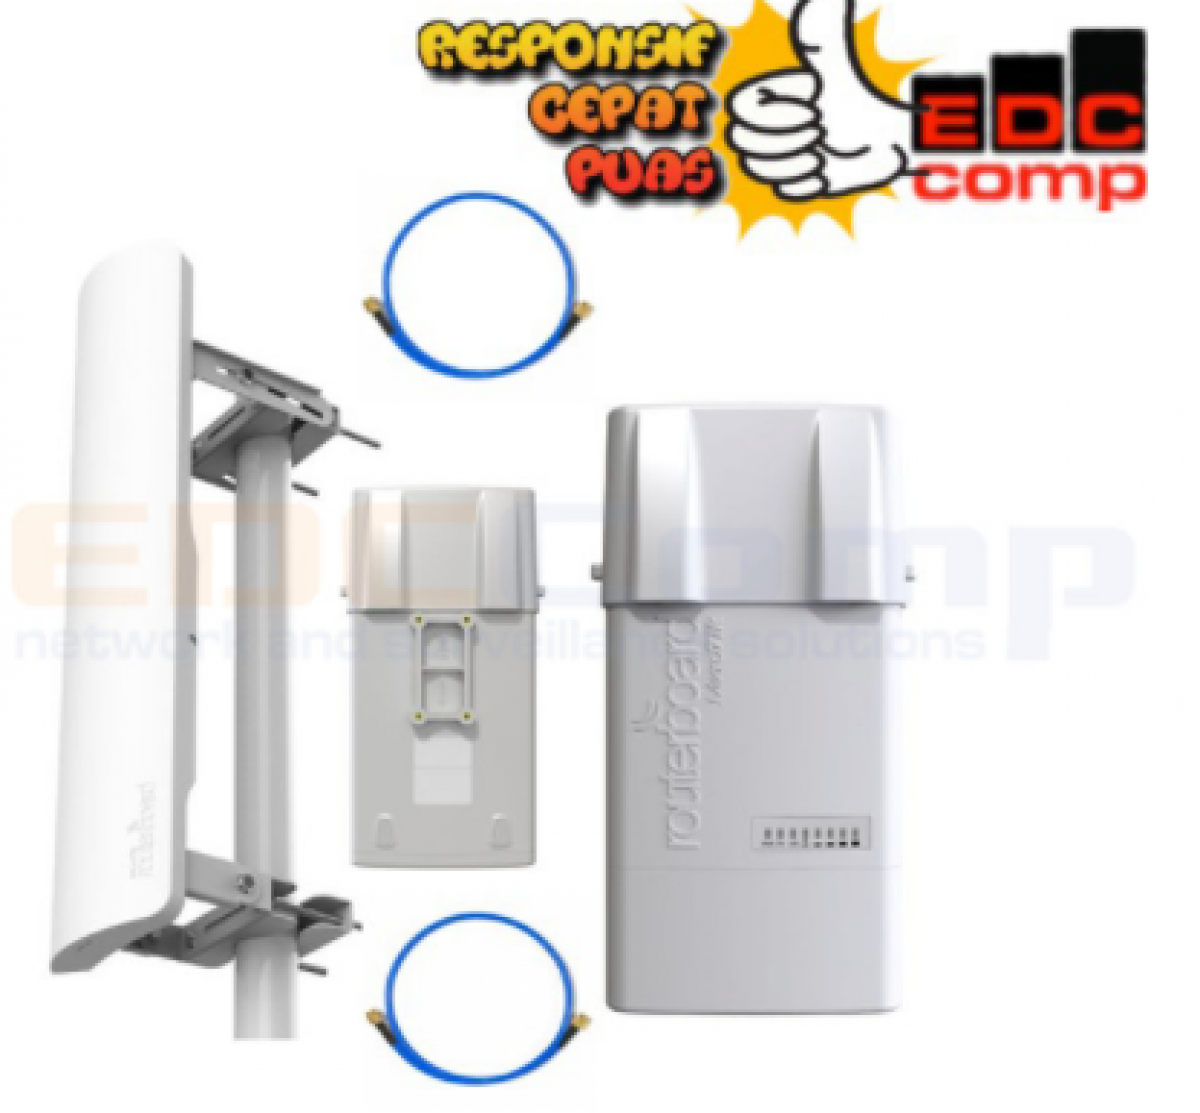 Paket Mikrotik BaseBox 5 + Sector Antenna mANT 19S MTAS-5G-19D12 - EdcComp